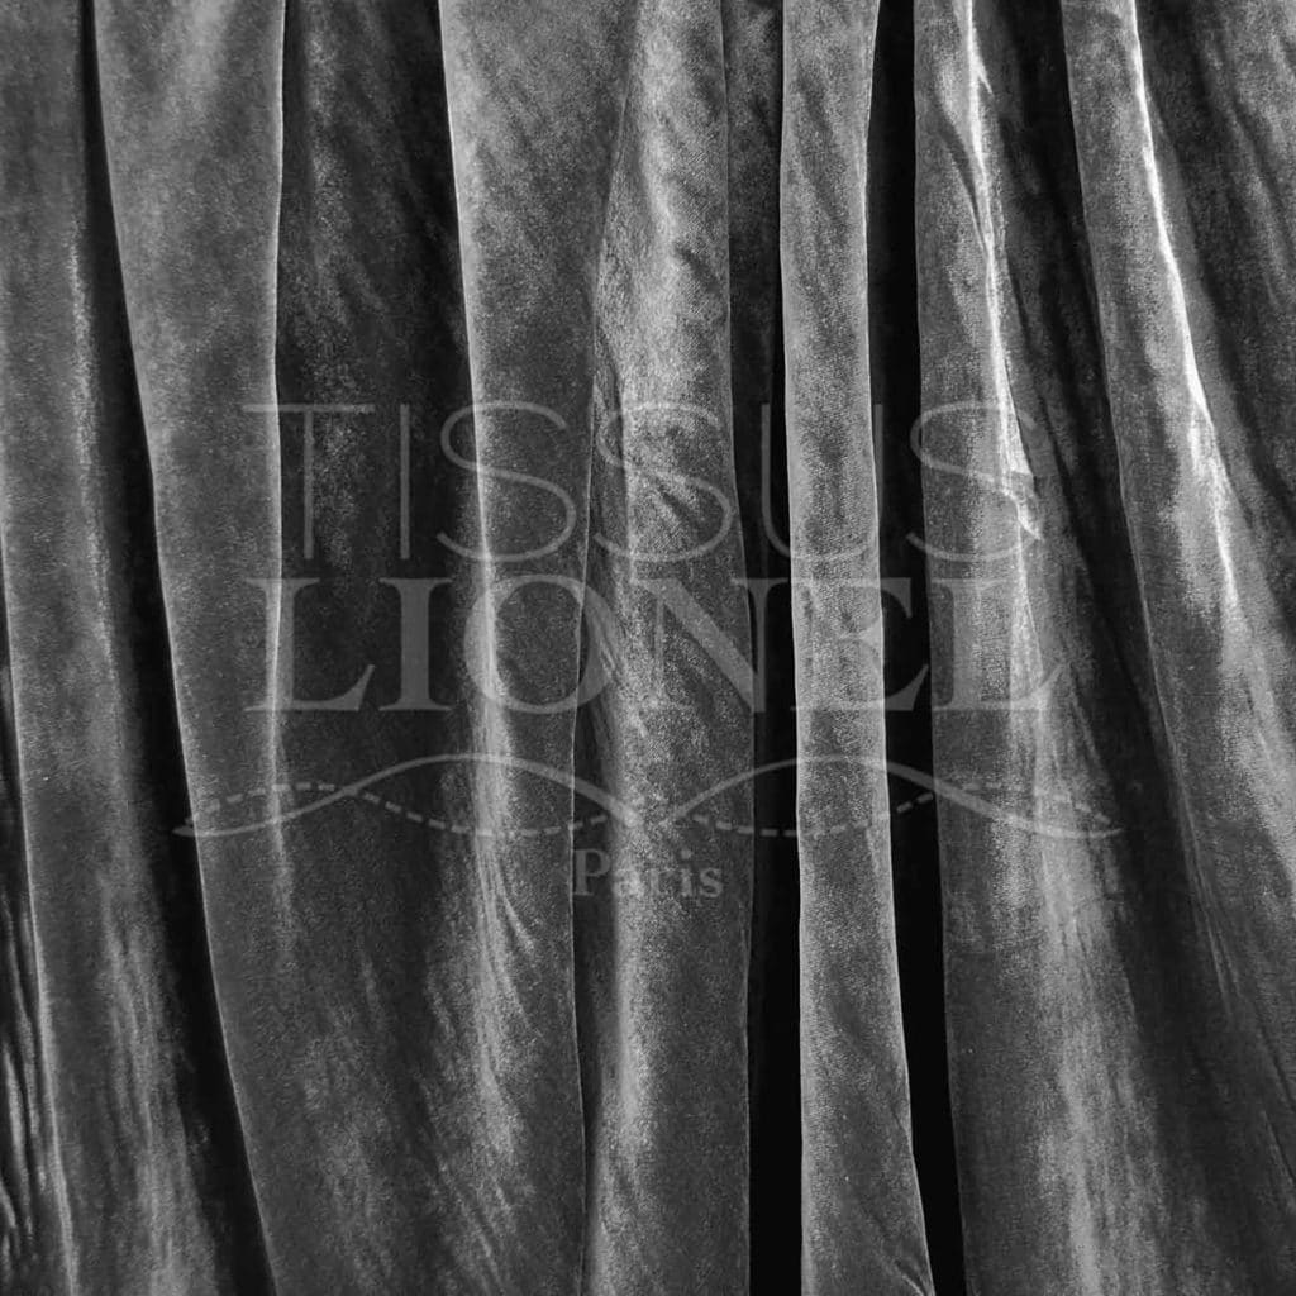 fd8fc20b812 VELVET SILK DARK GRAY - Lionel Fabrics